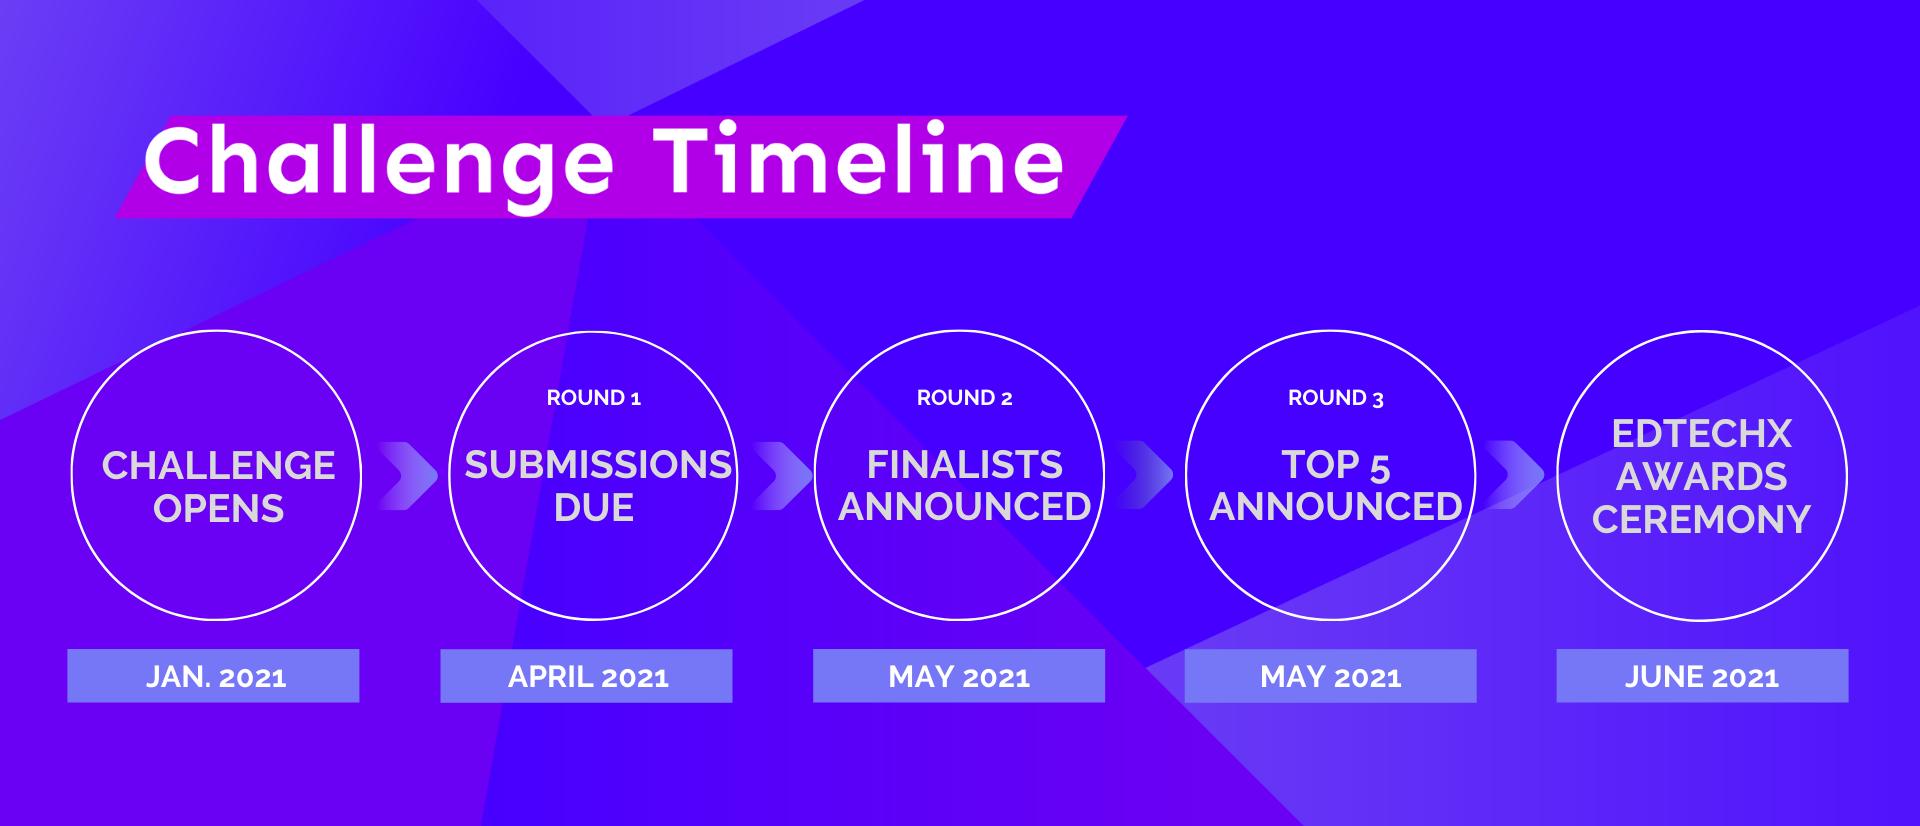 Updated Challenge Timeline